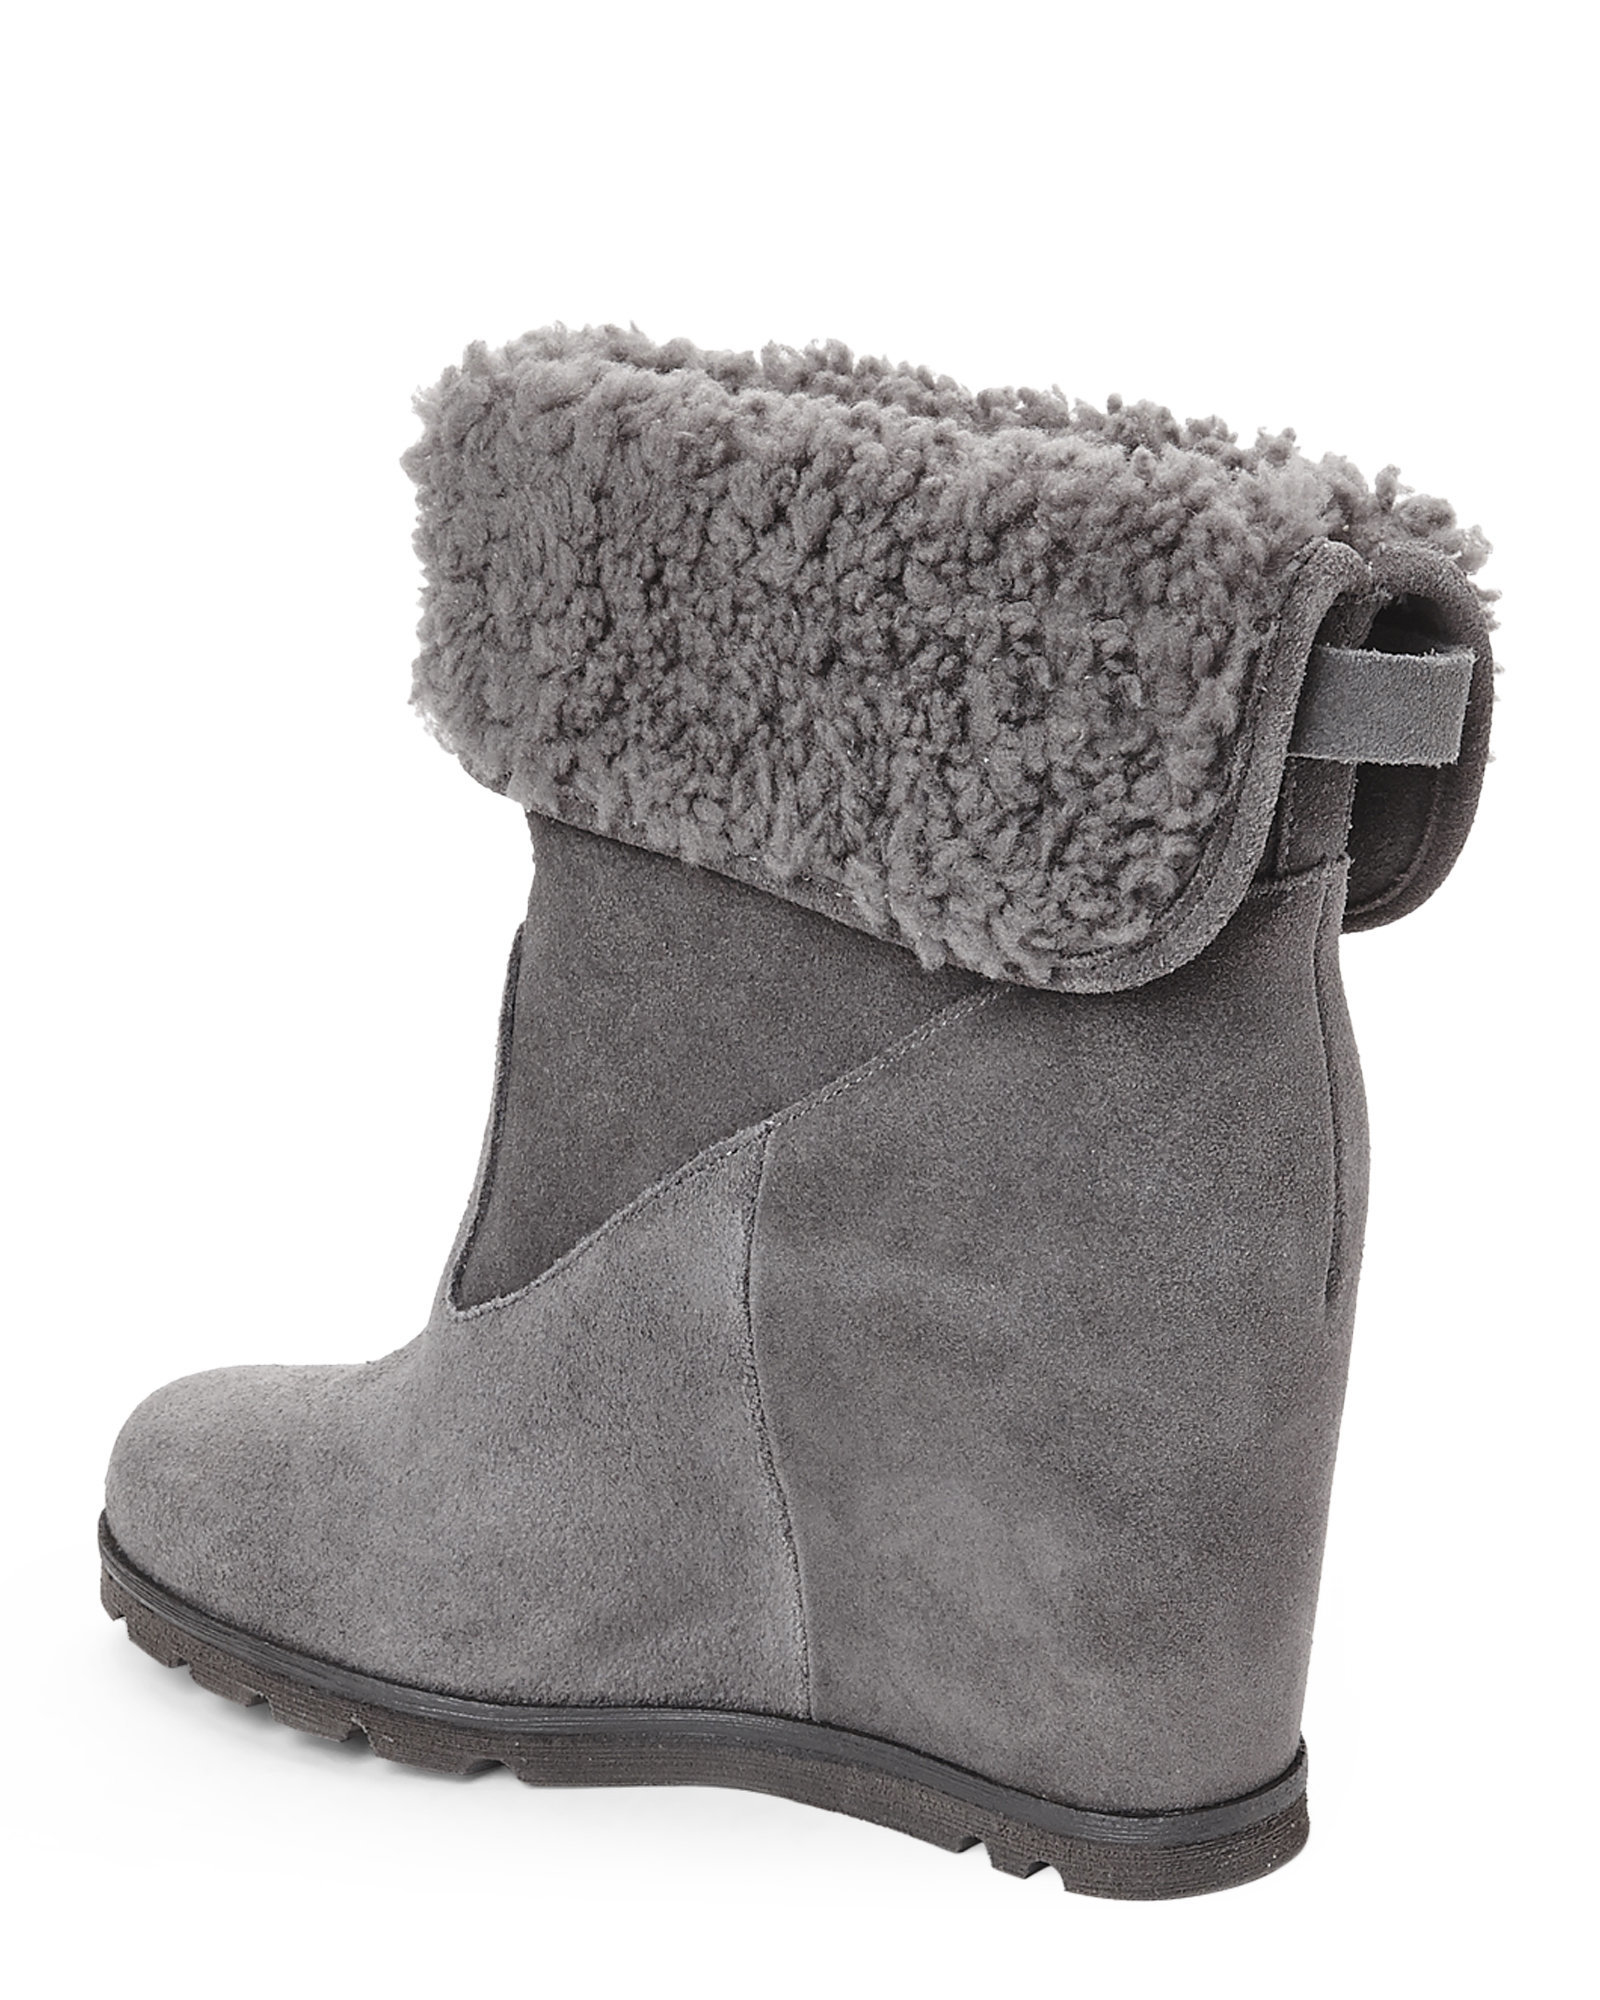 94972c3640a UGG Gray Grey Kyra Wedge Boots